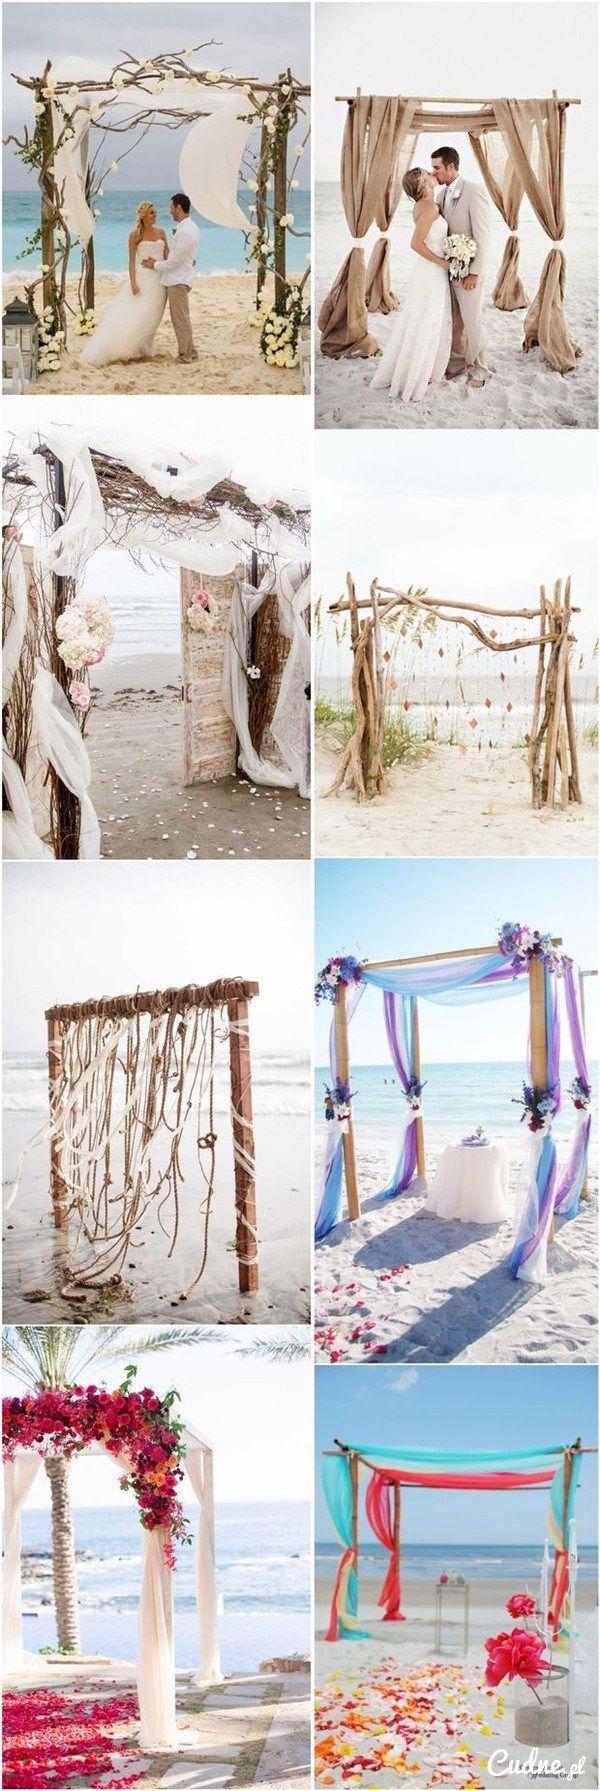 Beach wedding decorations diy  DIY Beach Wedding Decoration Ideas  mareeus sunset party